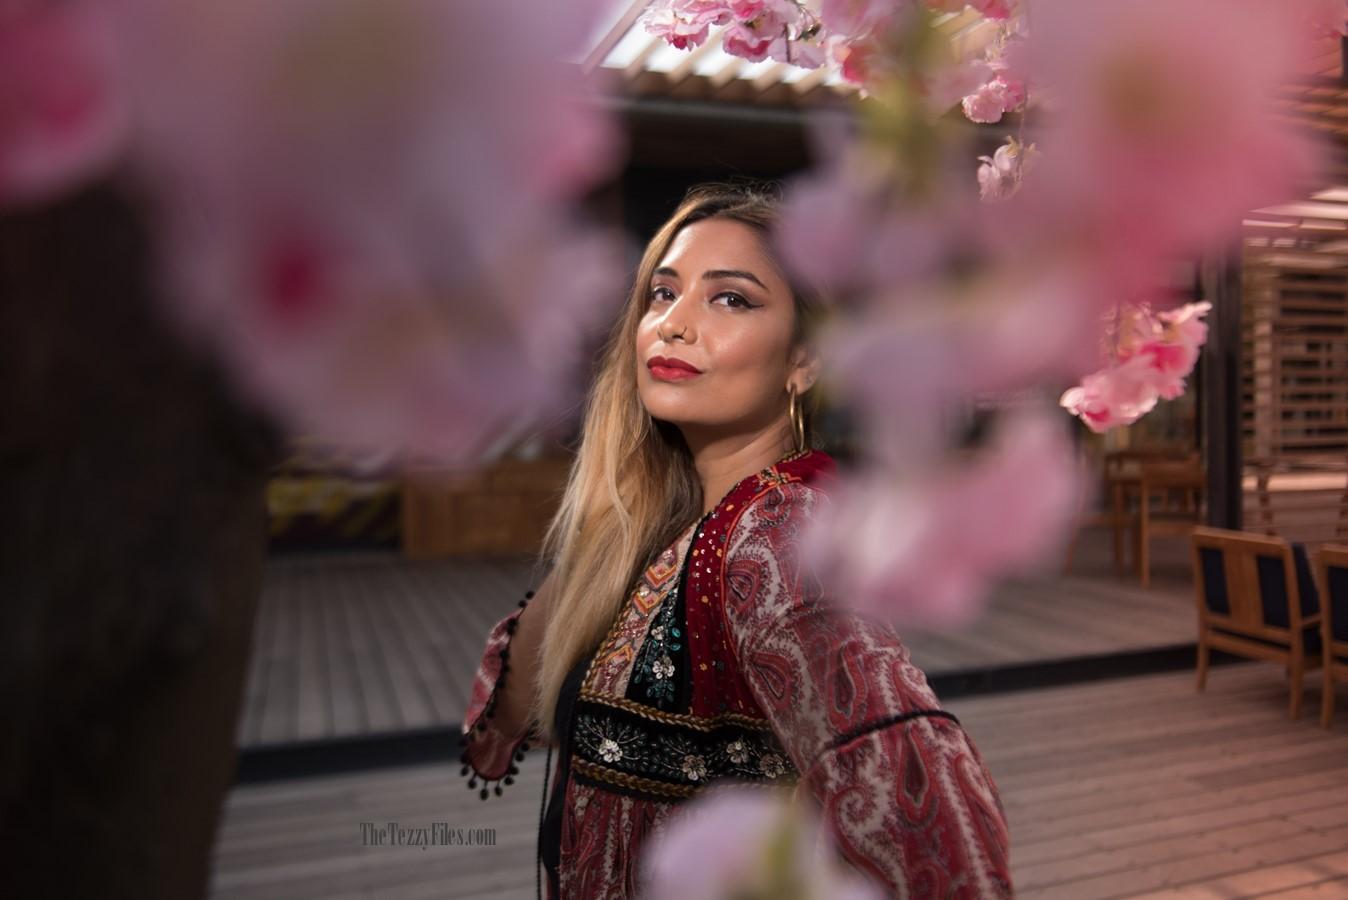 Dubai Fashion Blog Fashionista Blogger La Mer Dubai UAE influencer Middle East Zara Tribal Jacket Gypsy Style Beauty Fashion Shoot (6)